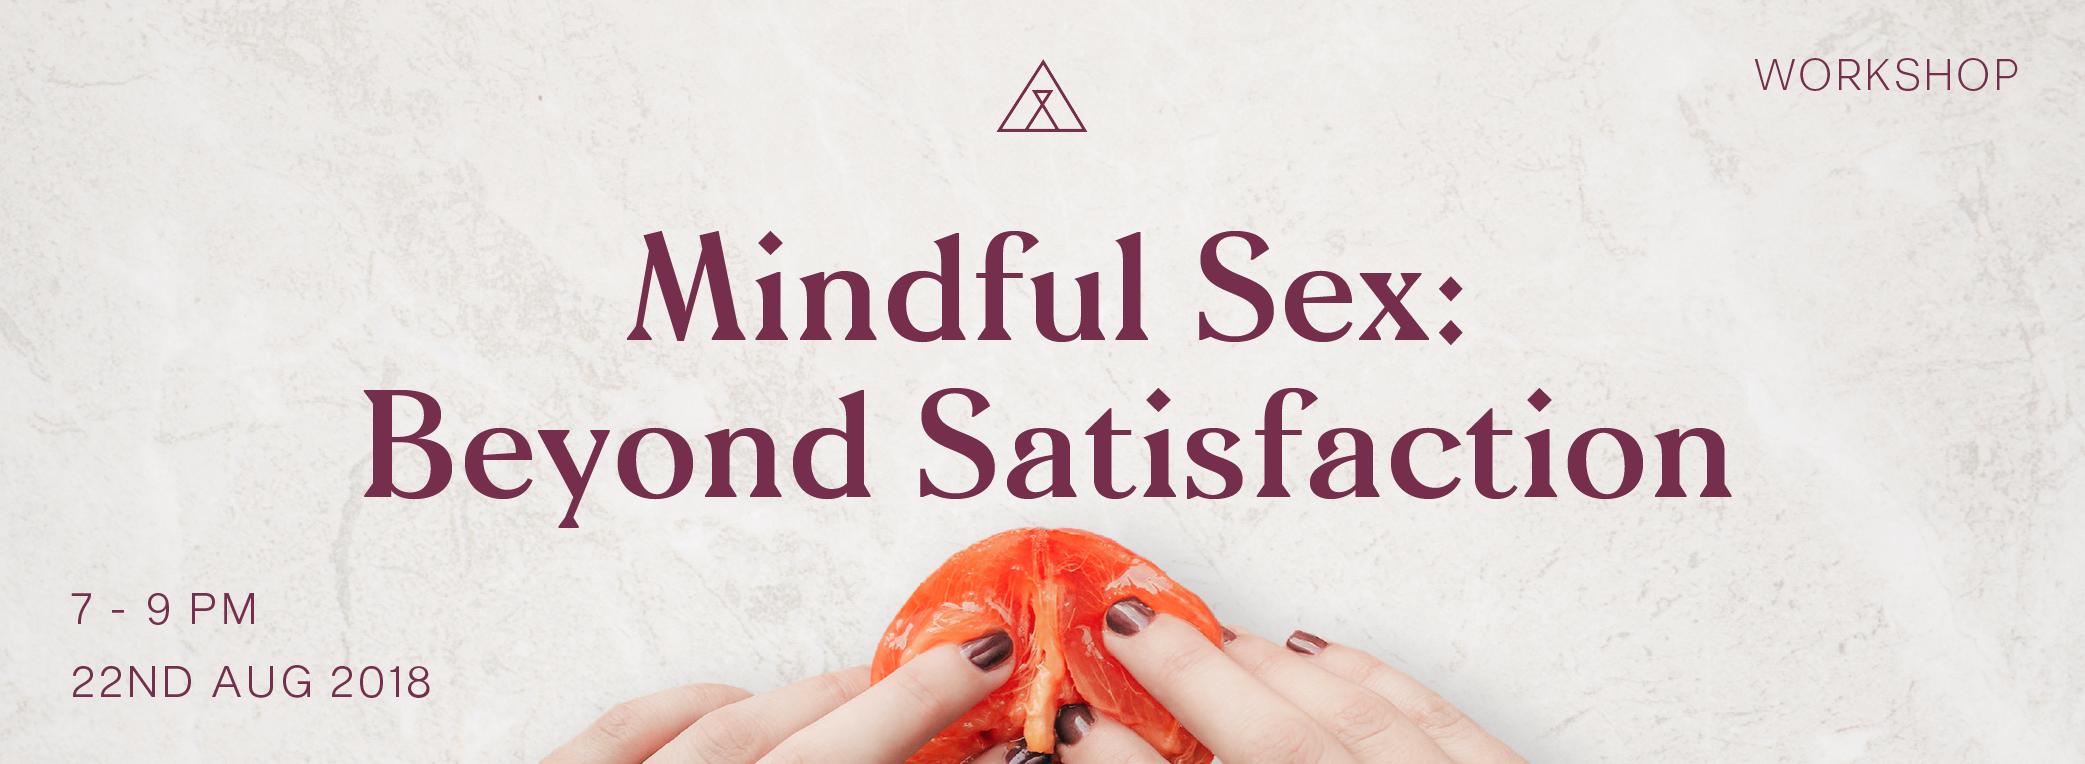 Beyond Satisfaction_Web Header